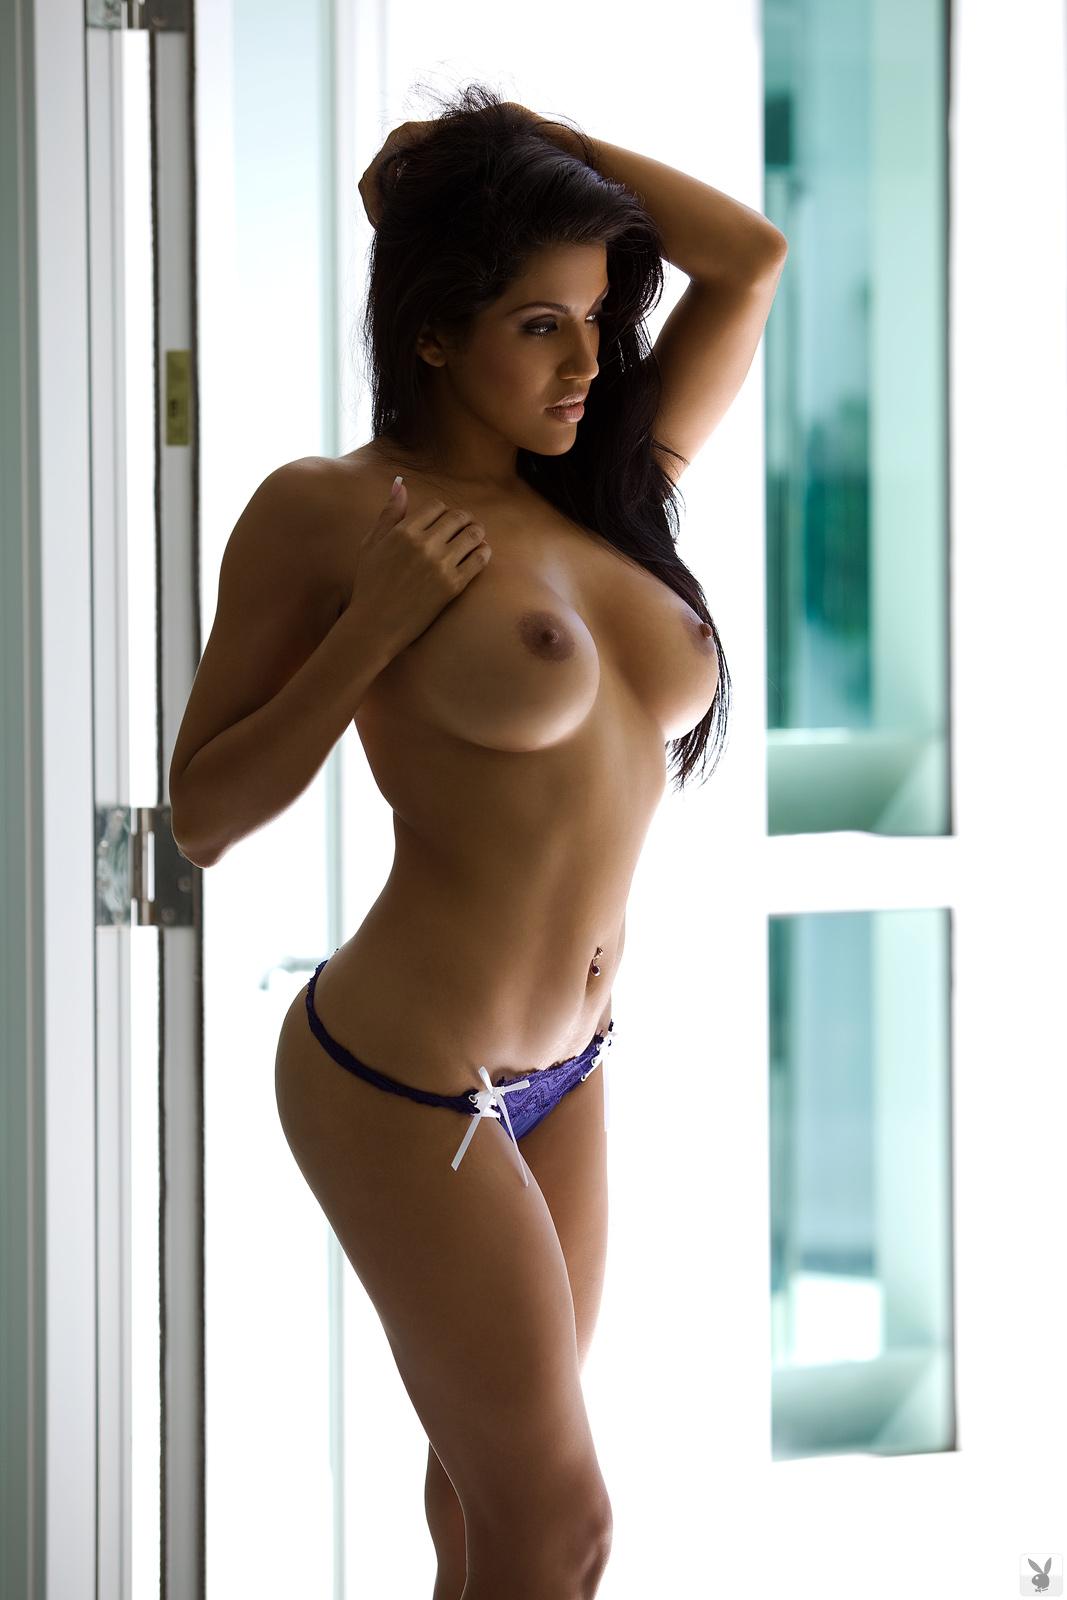 El Sexy Desnudo De Jessica Marie-1130